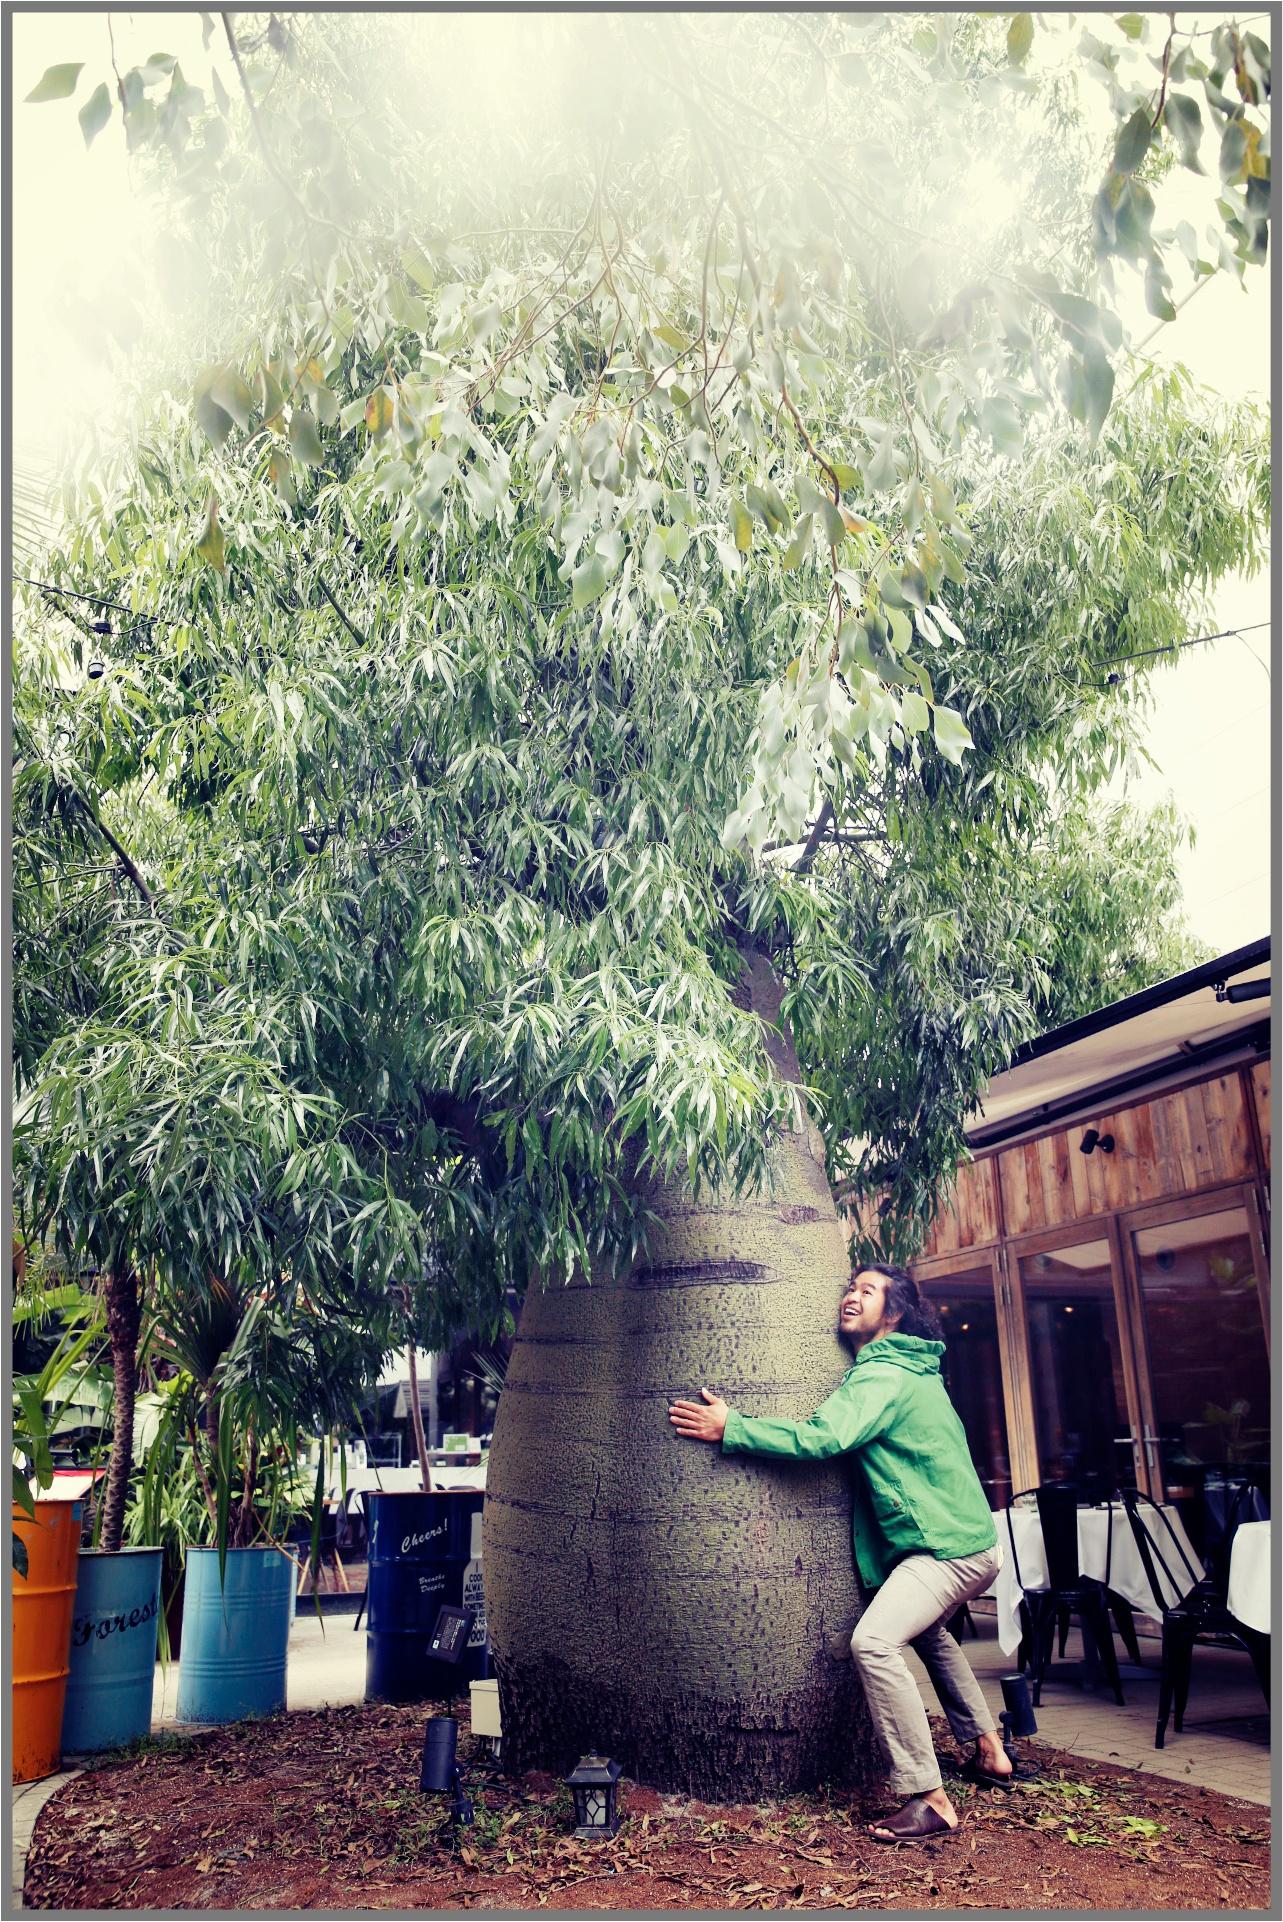 Nishihata_plant6_pic